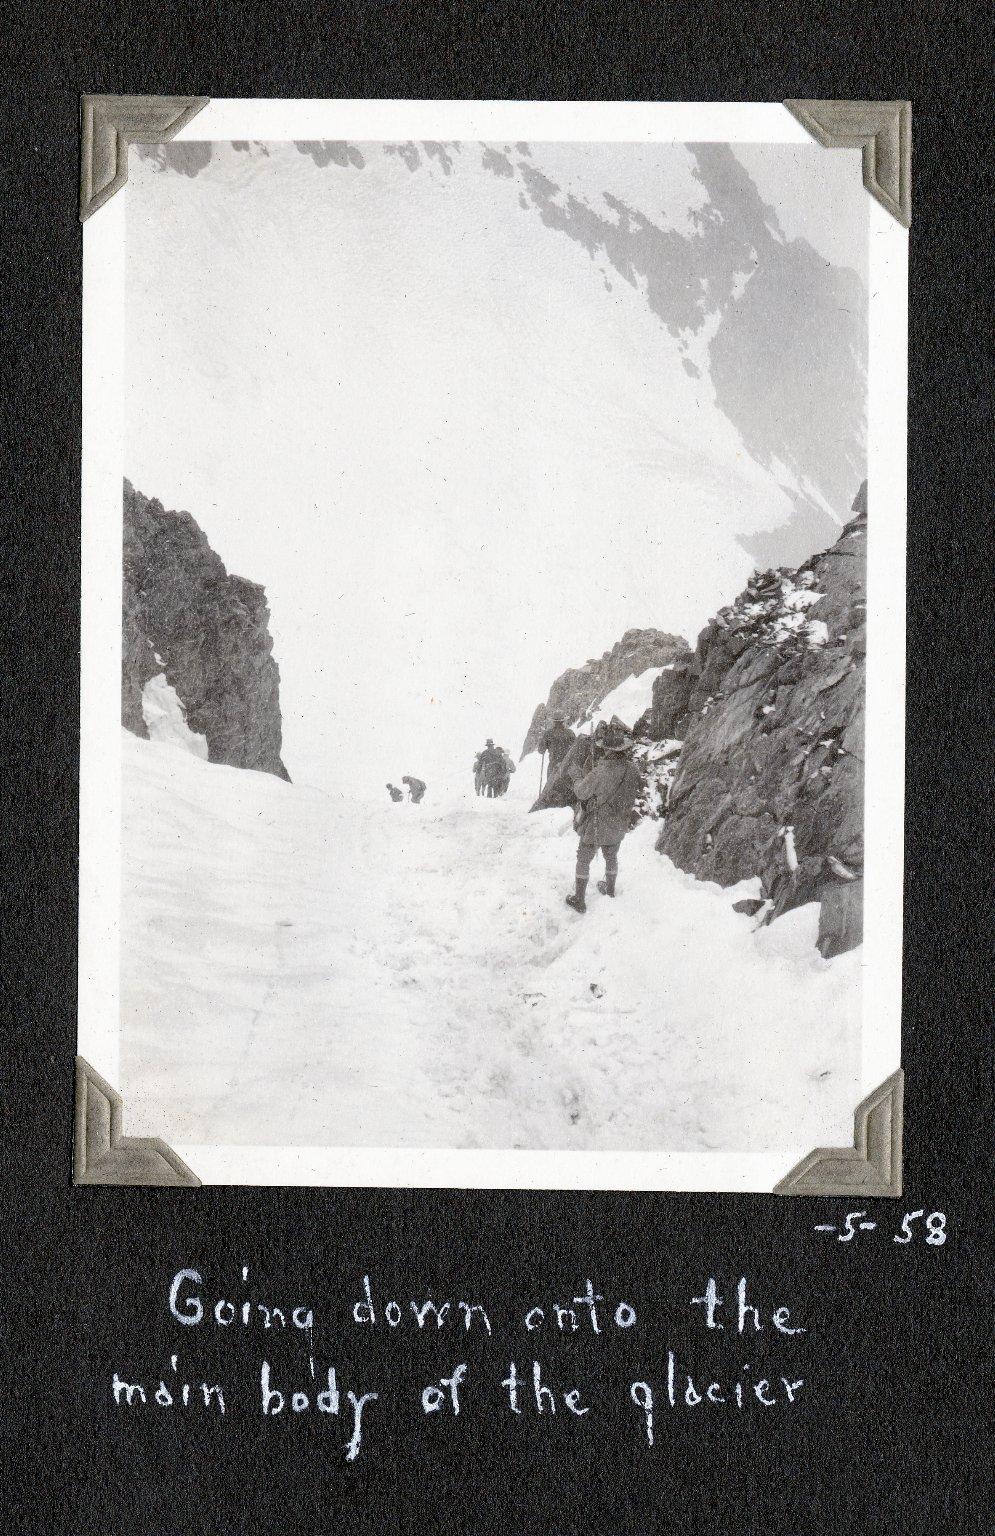 Going onto Killpacker Glacier